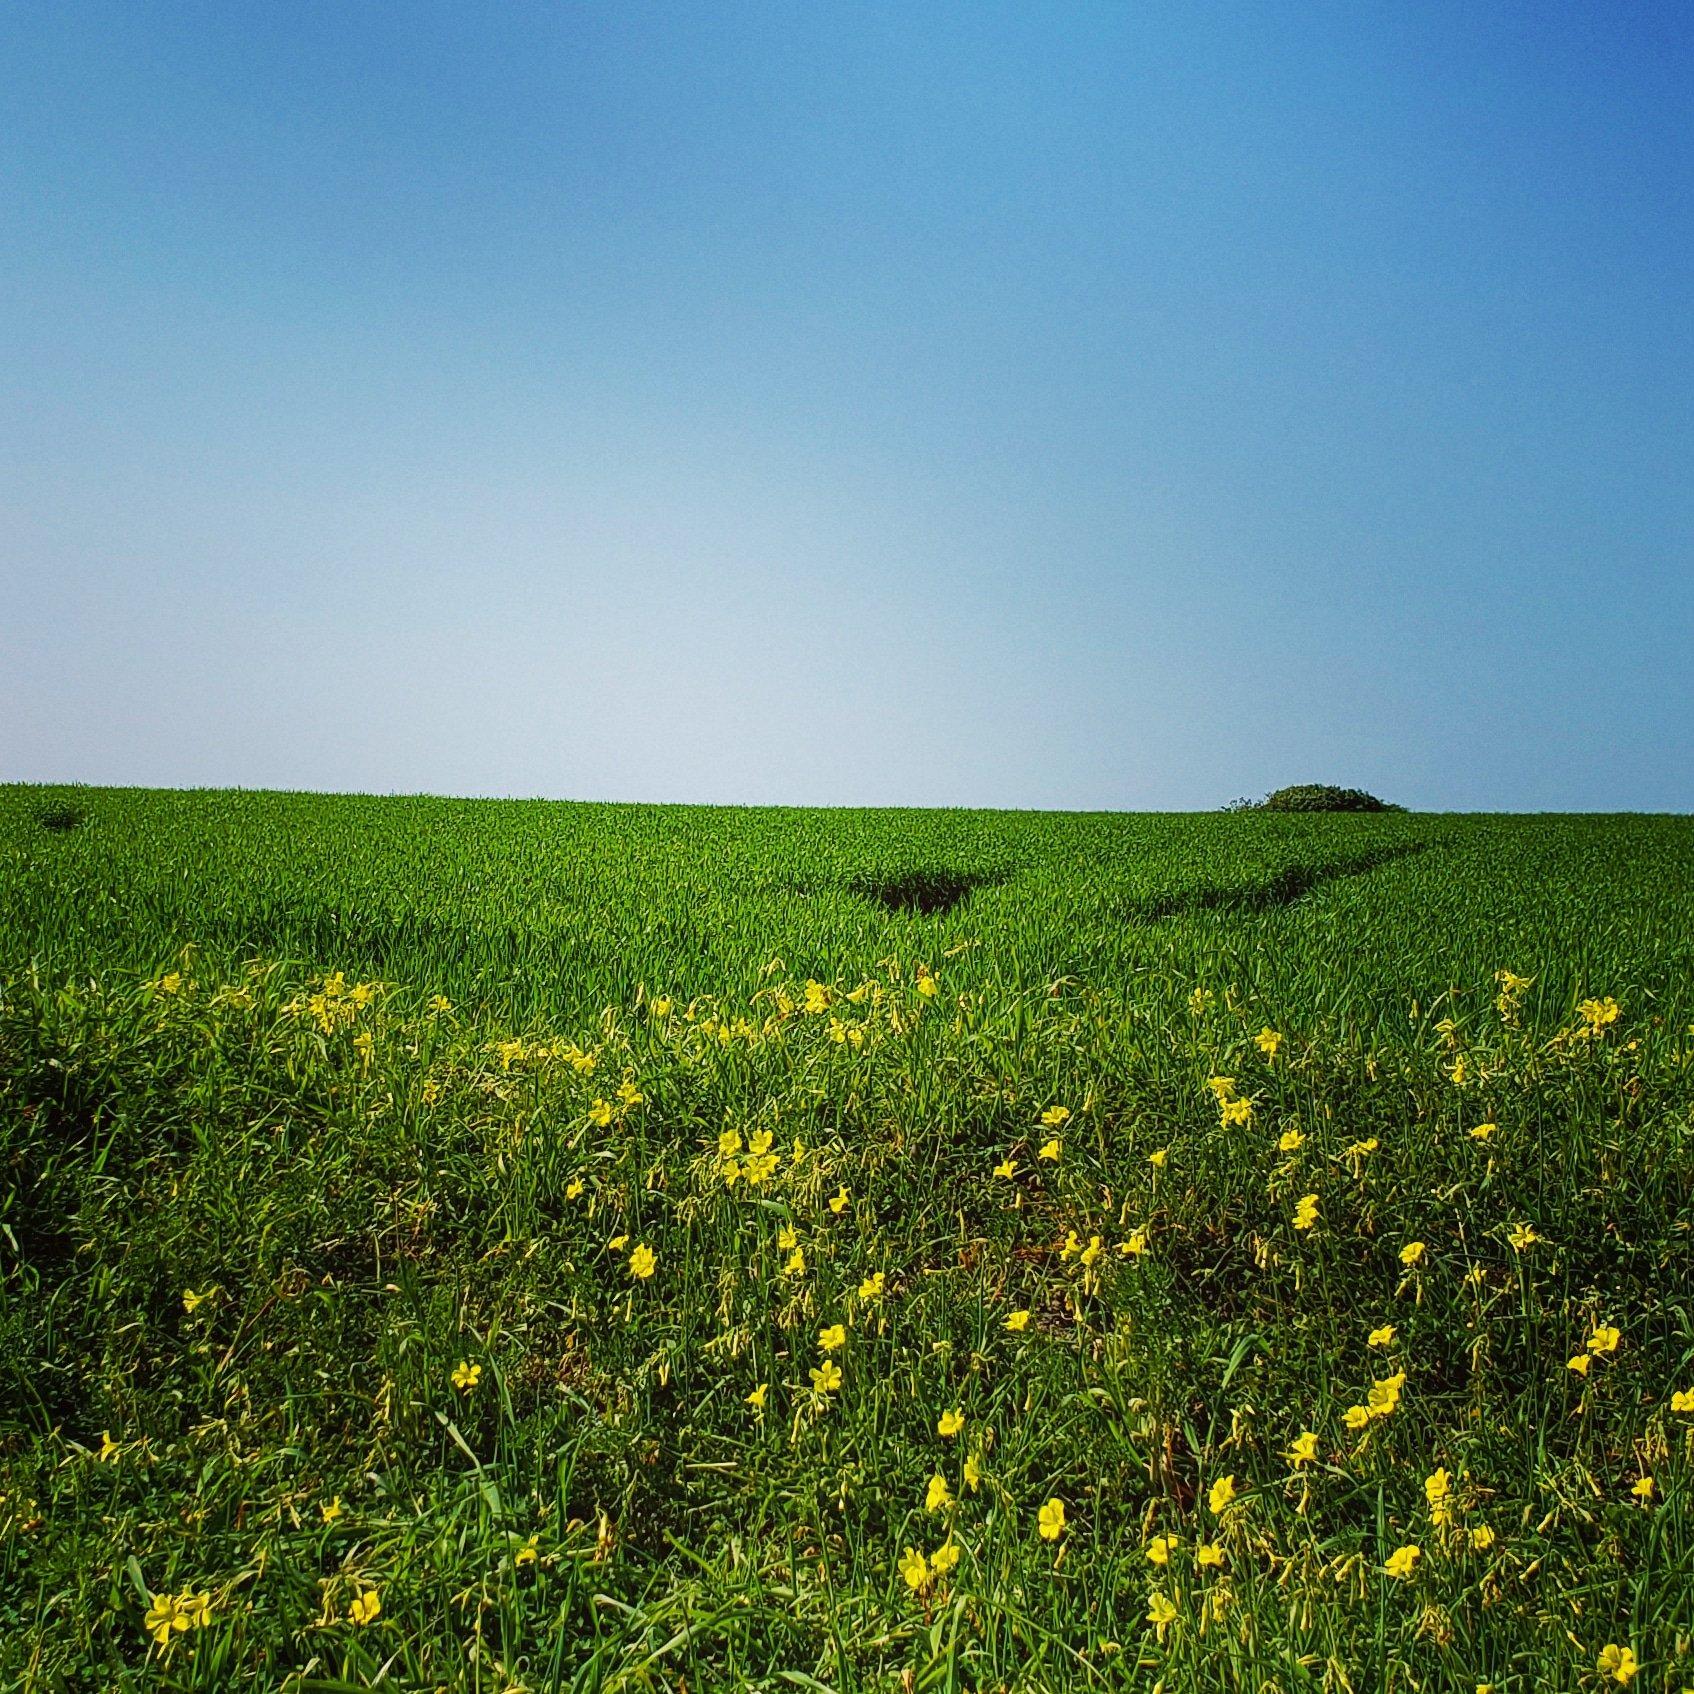 52 Reasons To Love Sicily   #1. Green Hillsides